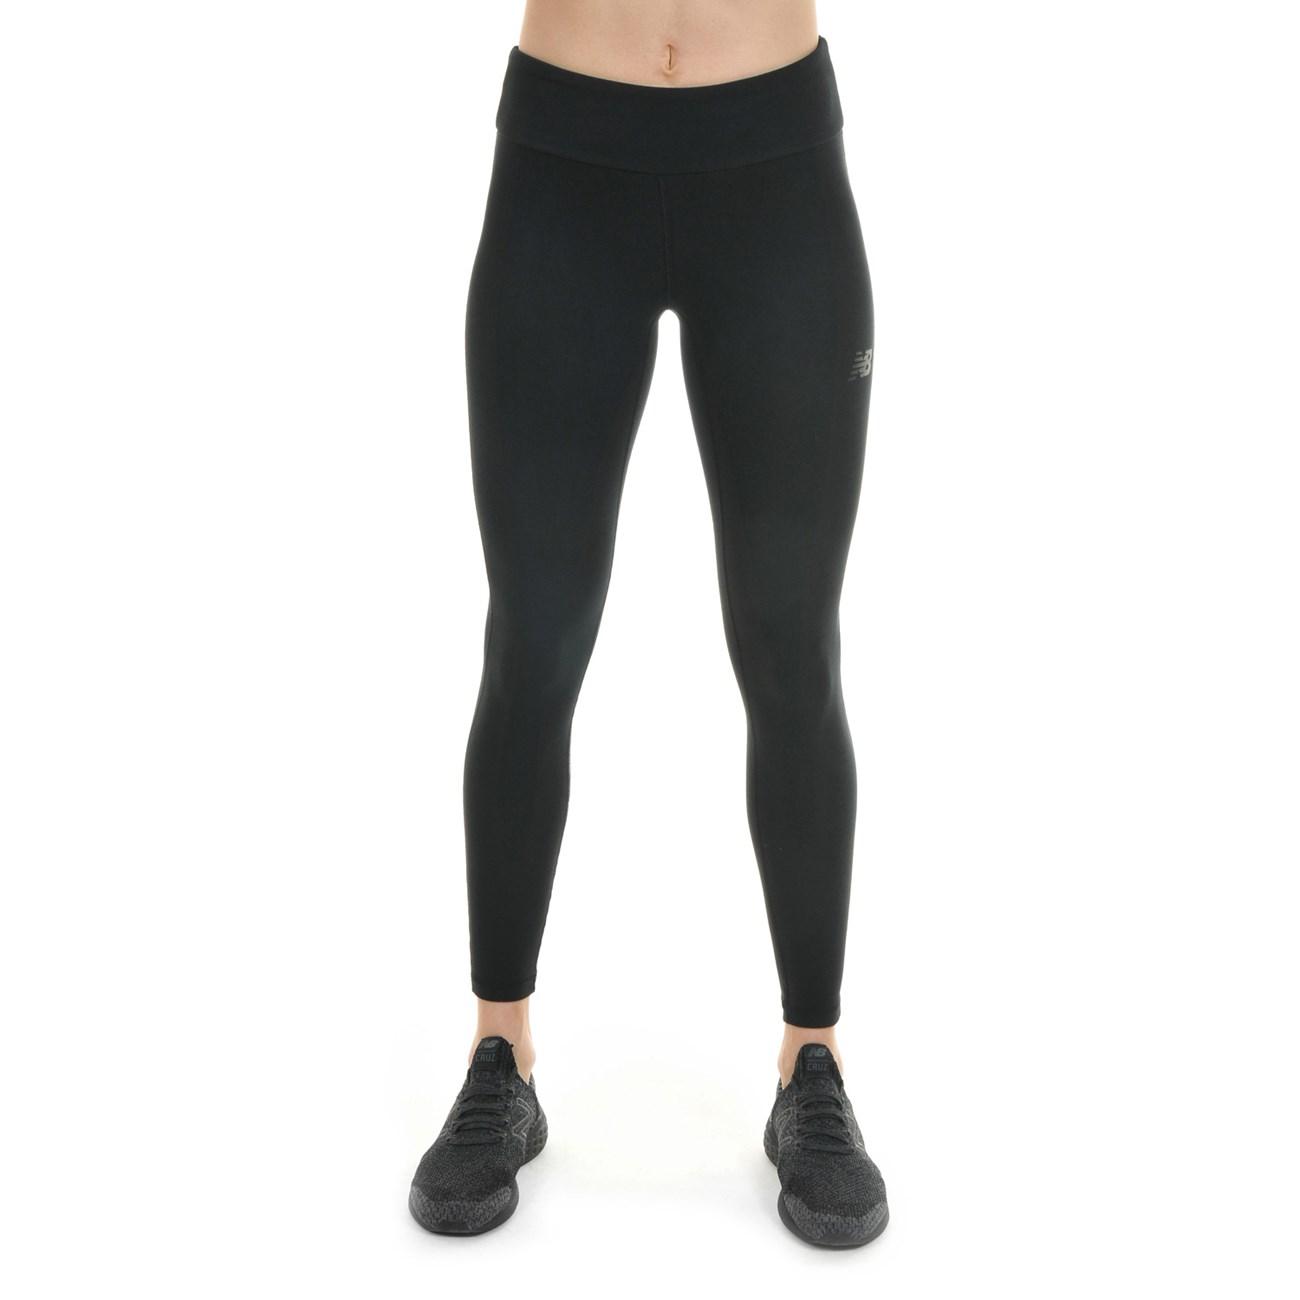 b283537e920f NEW BALANCE ATHLETICS LEGGING TIGHT   Γυναικεία Κολάν